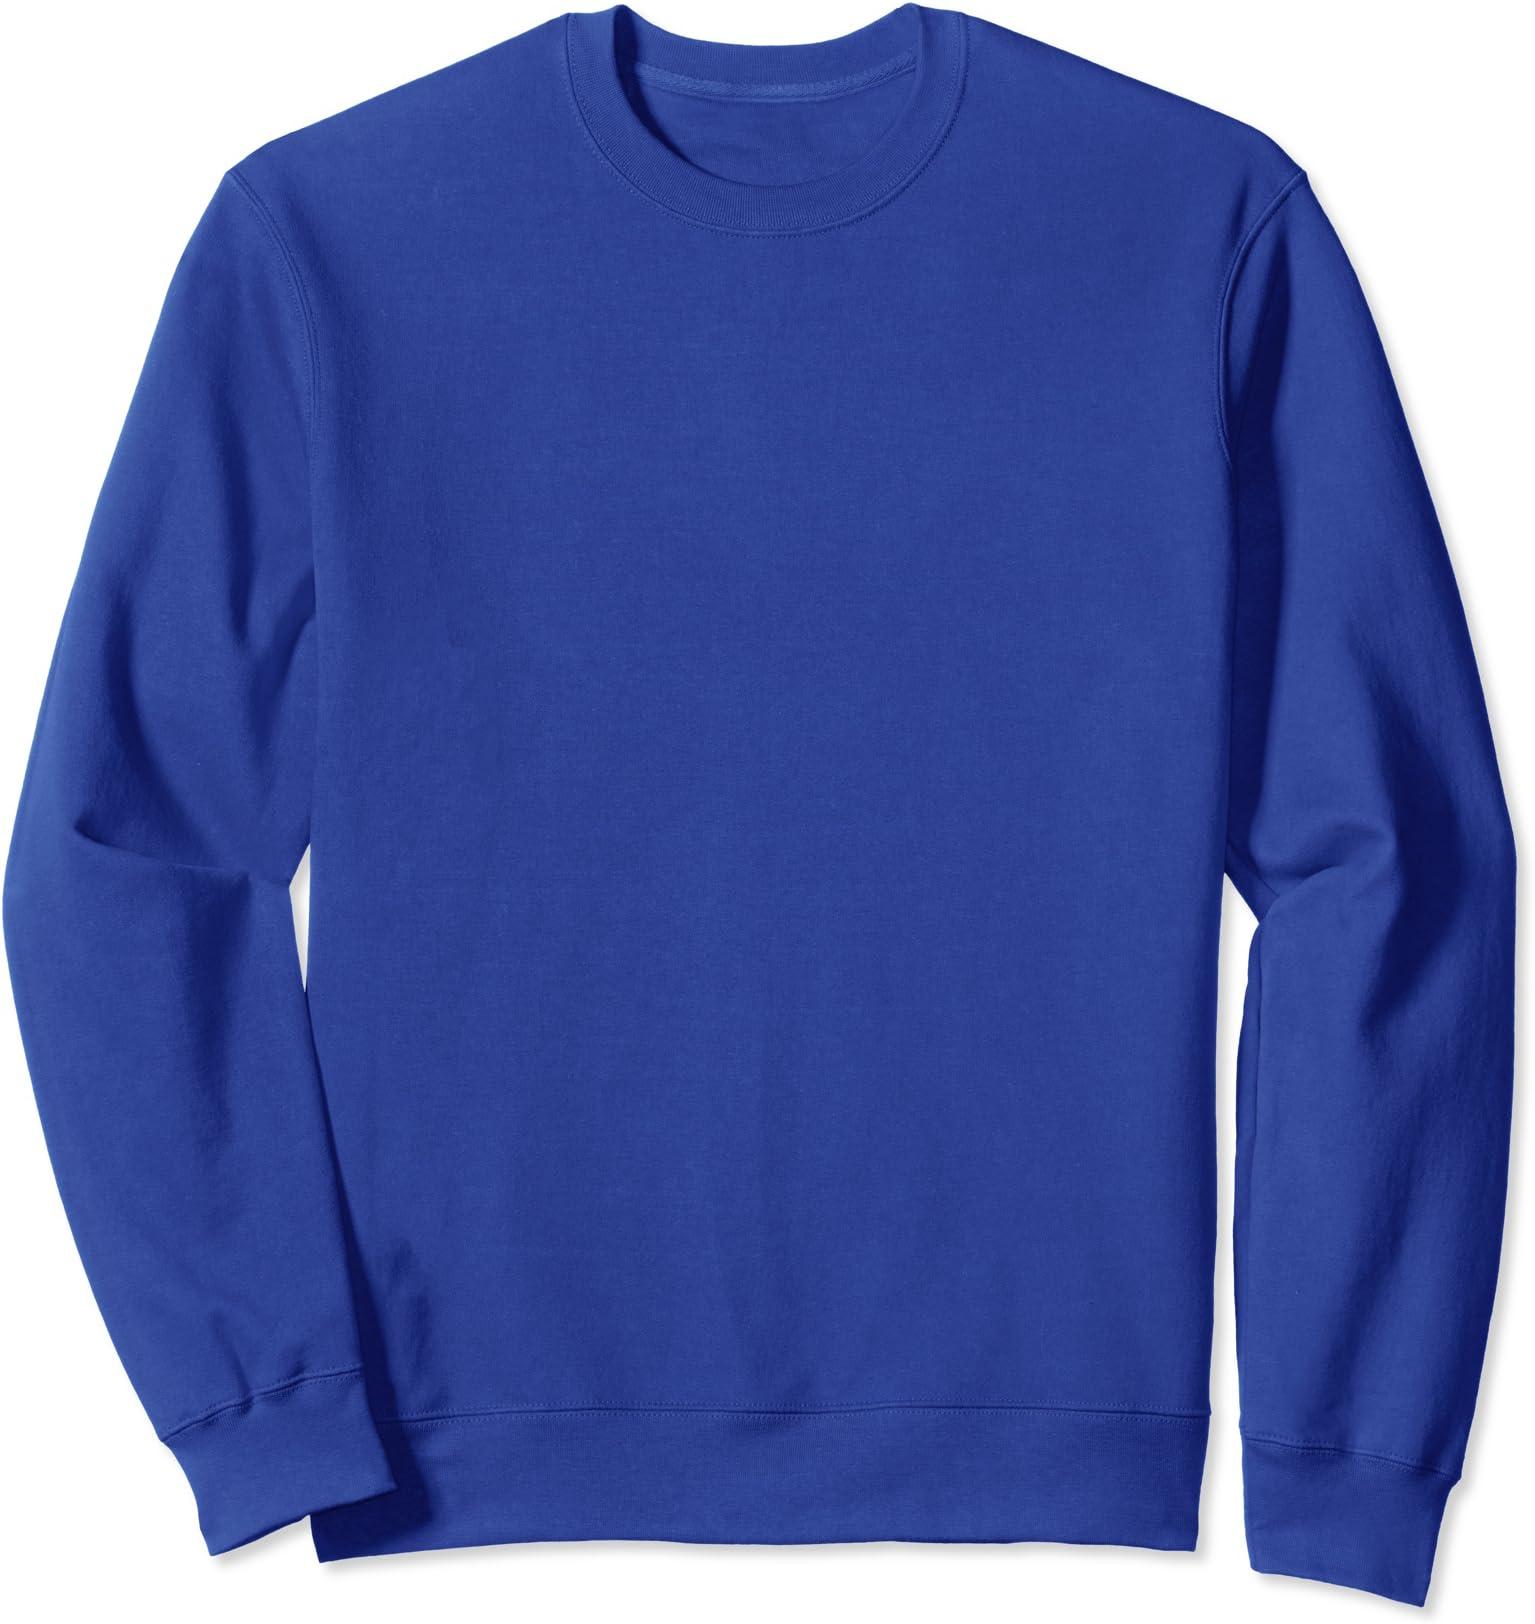 Magically Delicious Sweatshirt Unisex Mens Womens Top